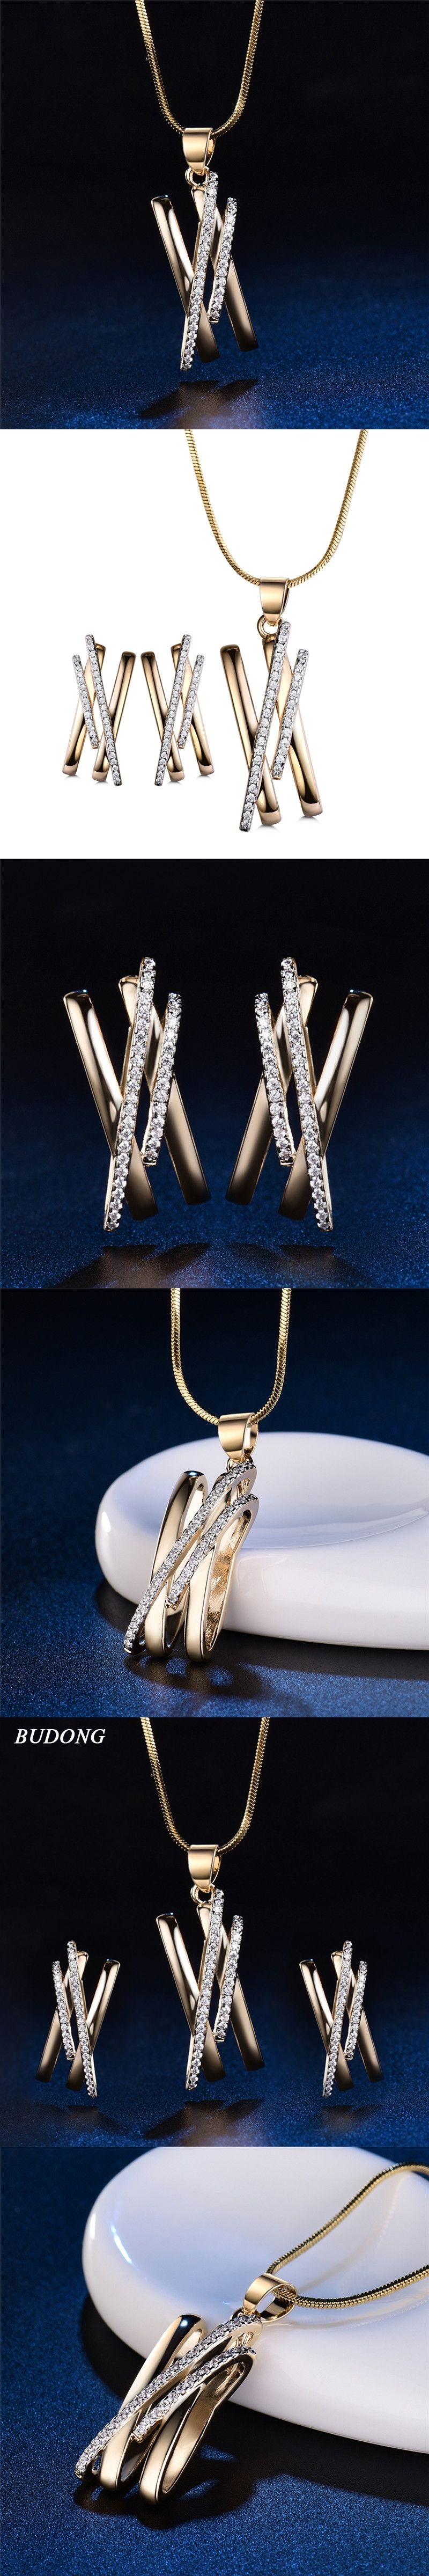 Budong infinity women necklace metallic earrings statement cross